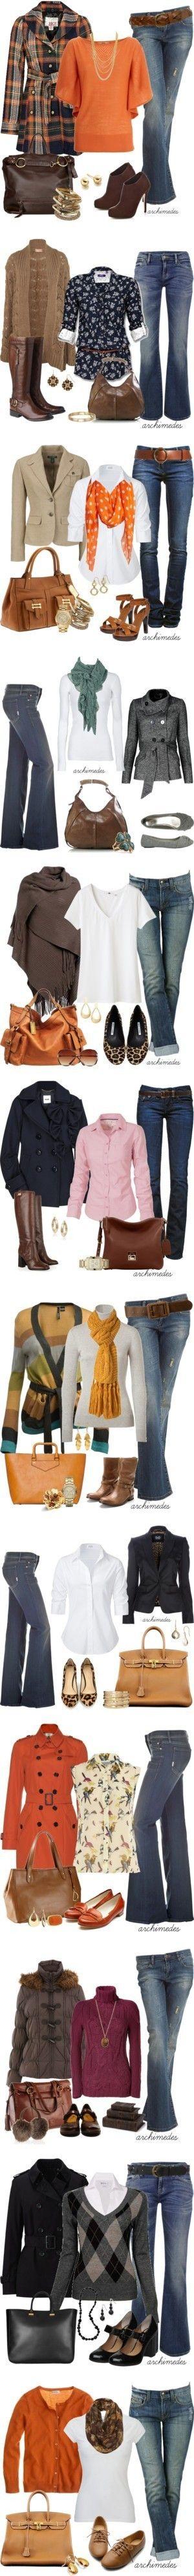 Super cute fall outfits